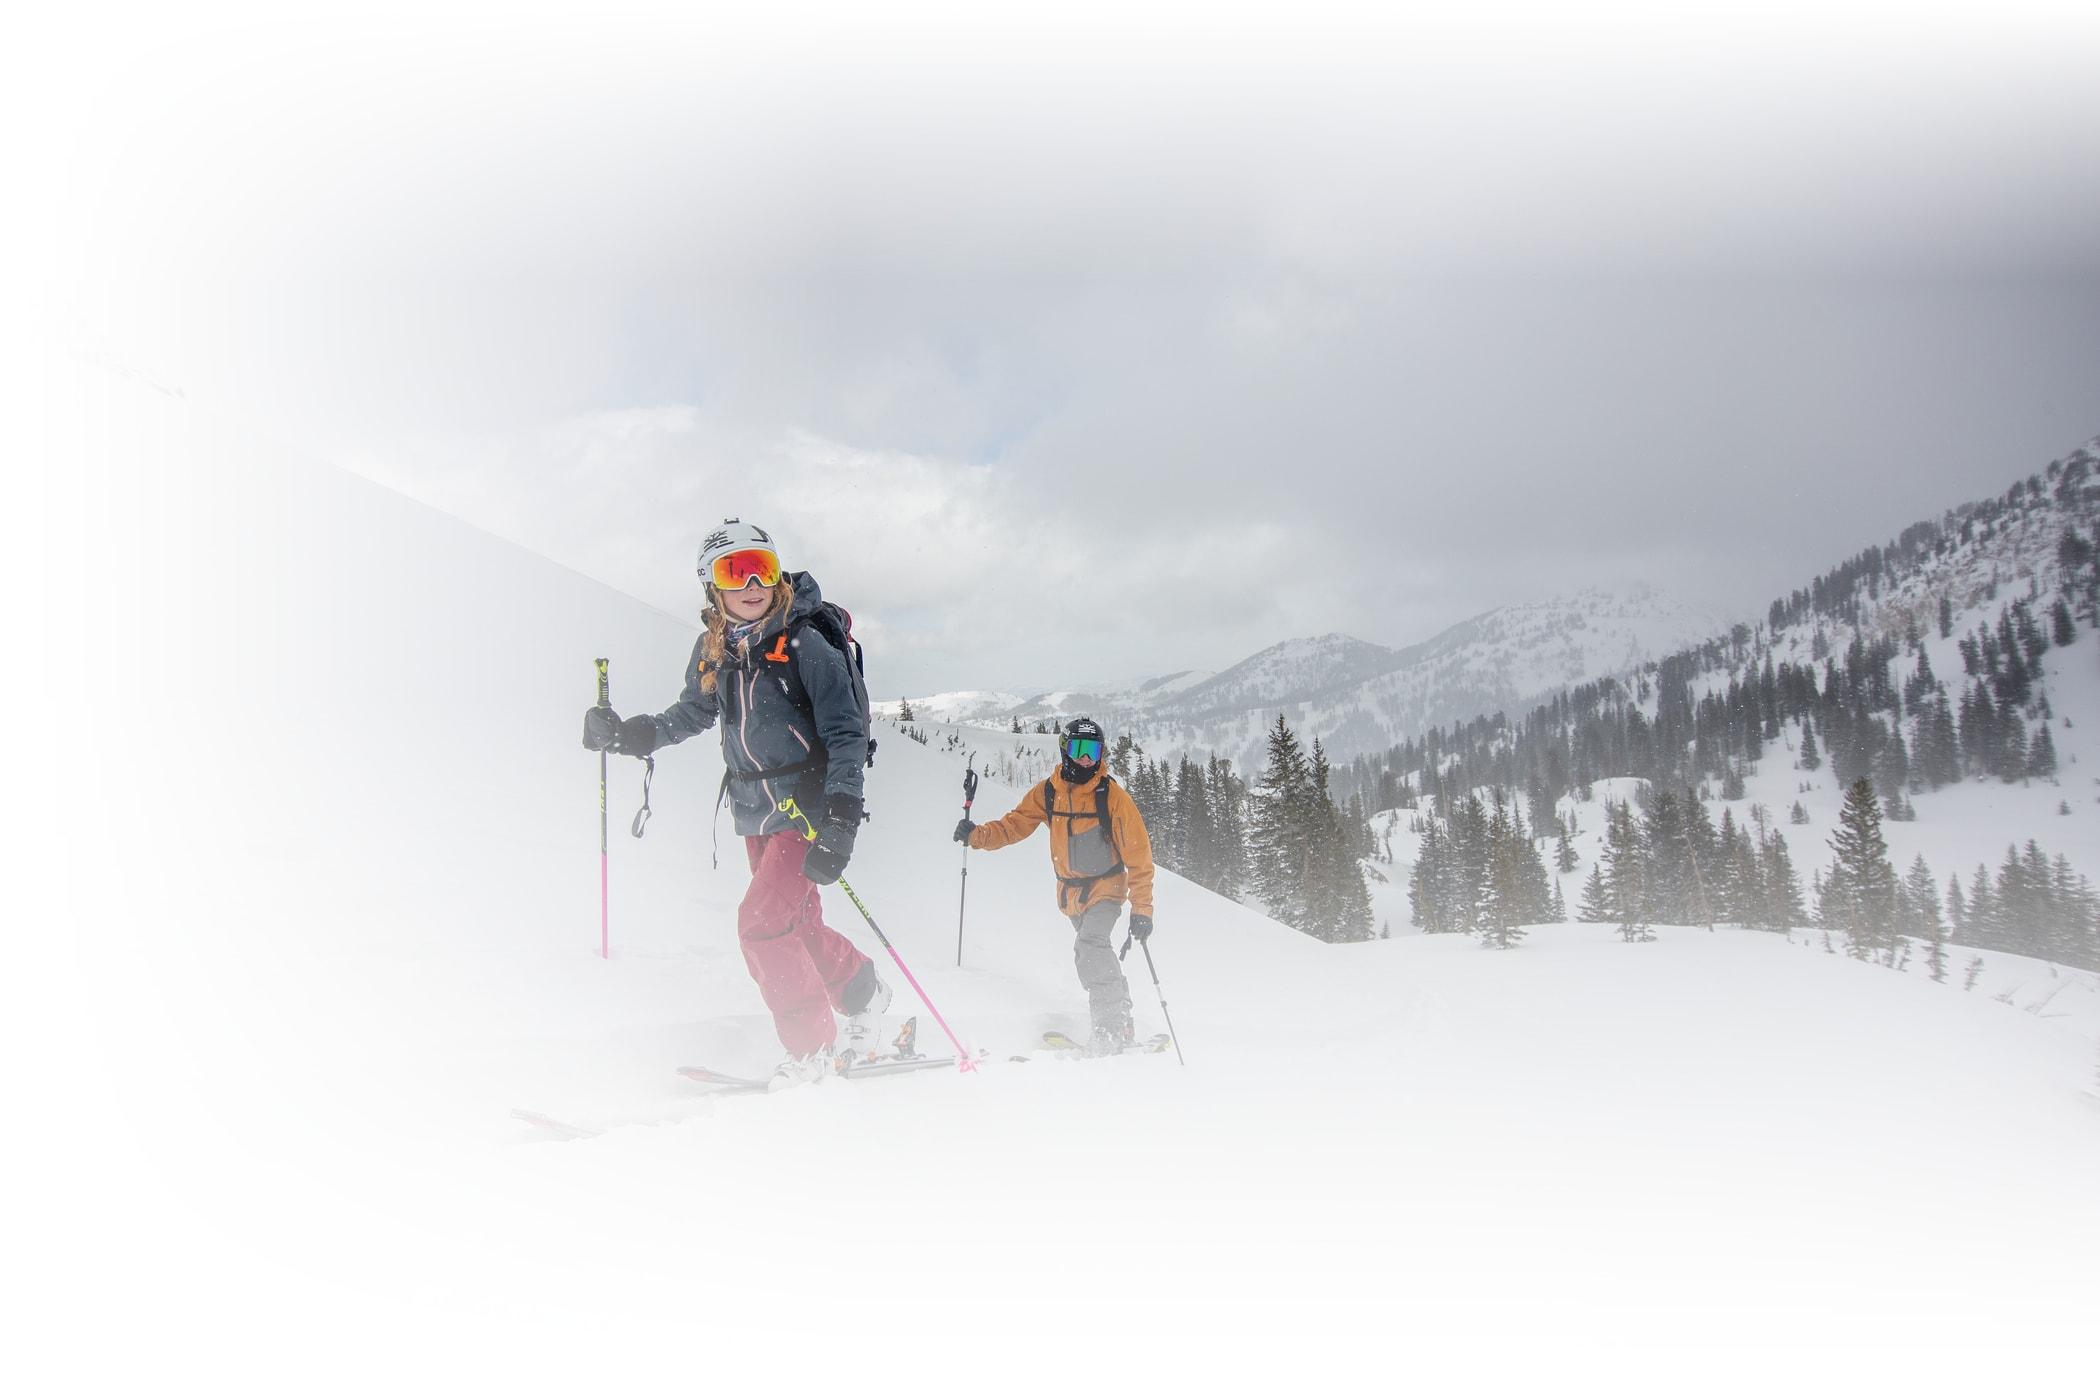 Skiers ski uphill